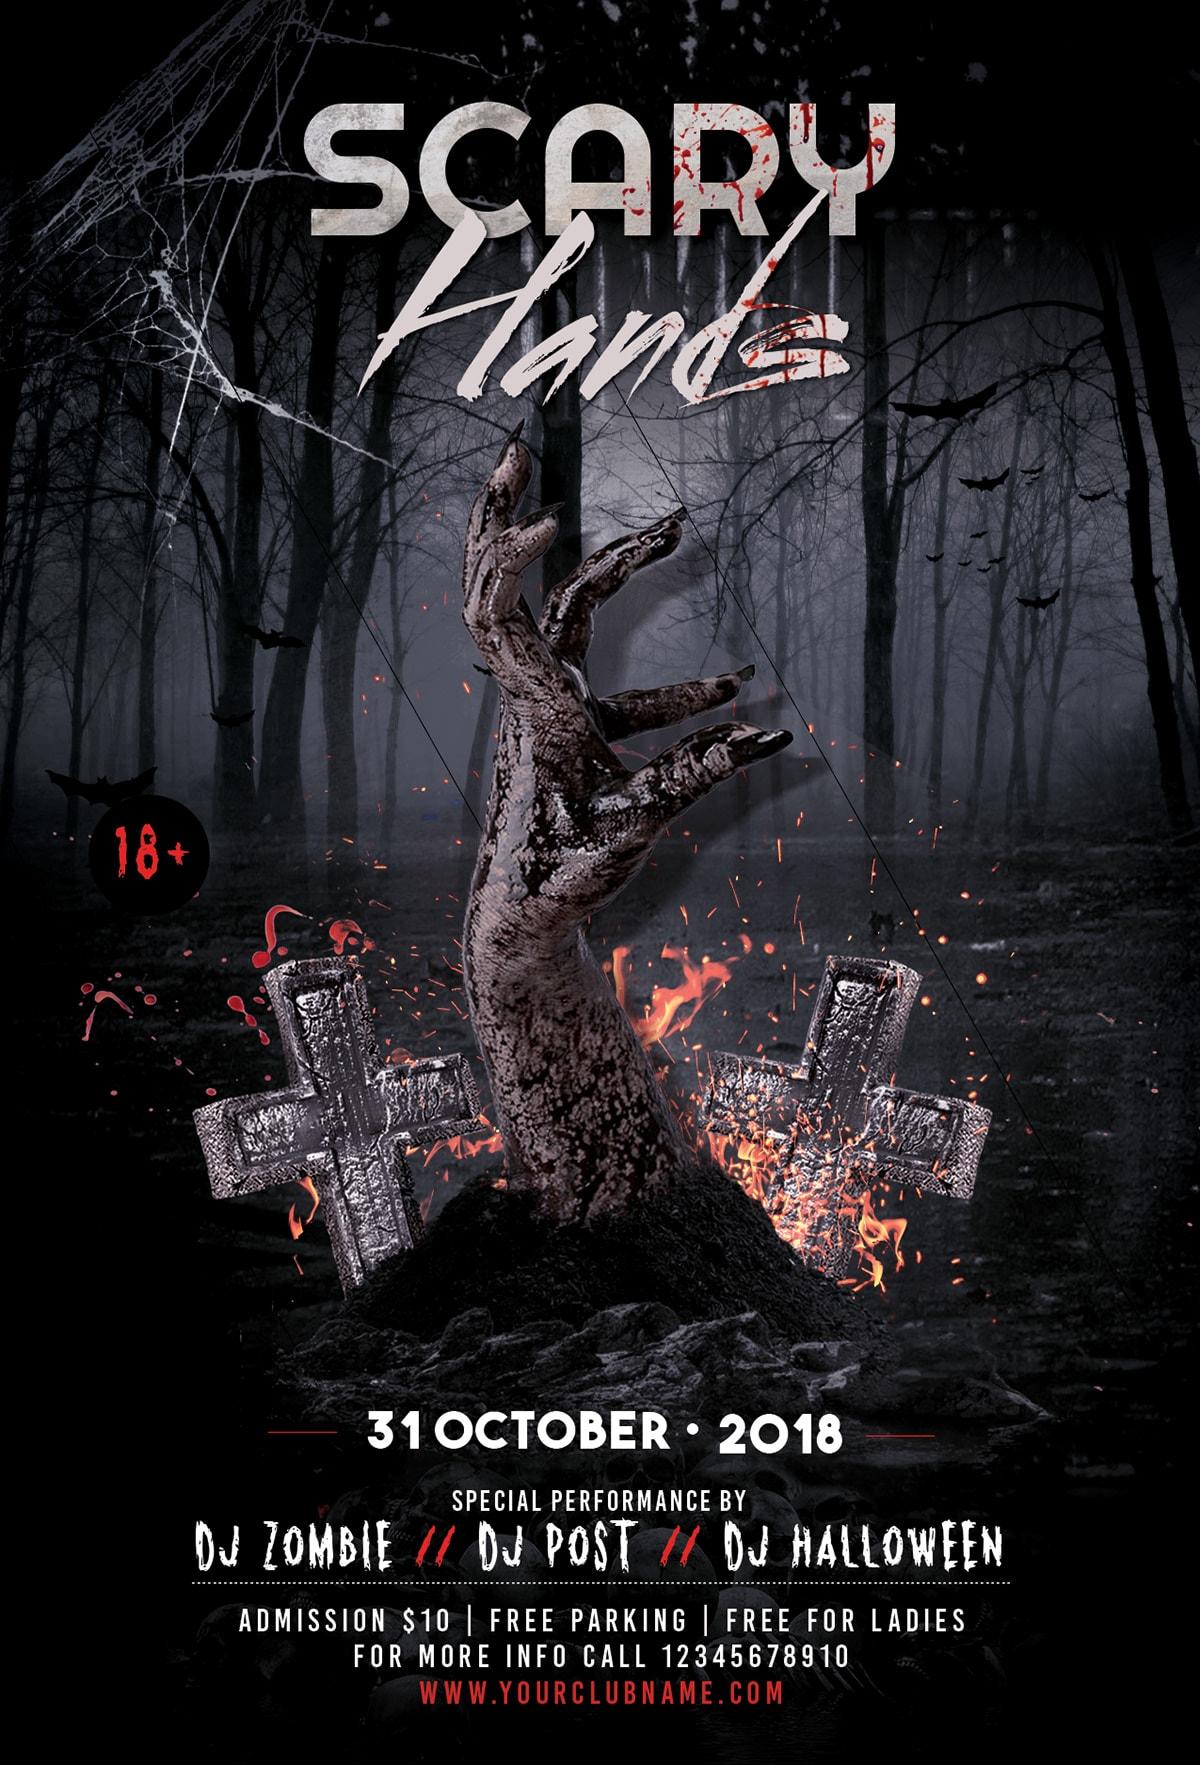 Scary Halloween Party - PSD Flyer-Invitation Template - Stockpsd.net